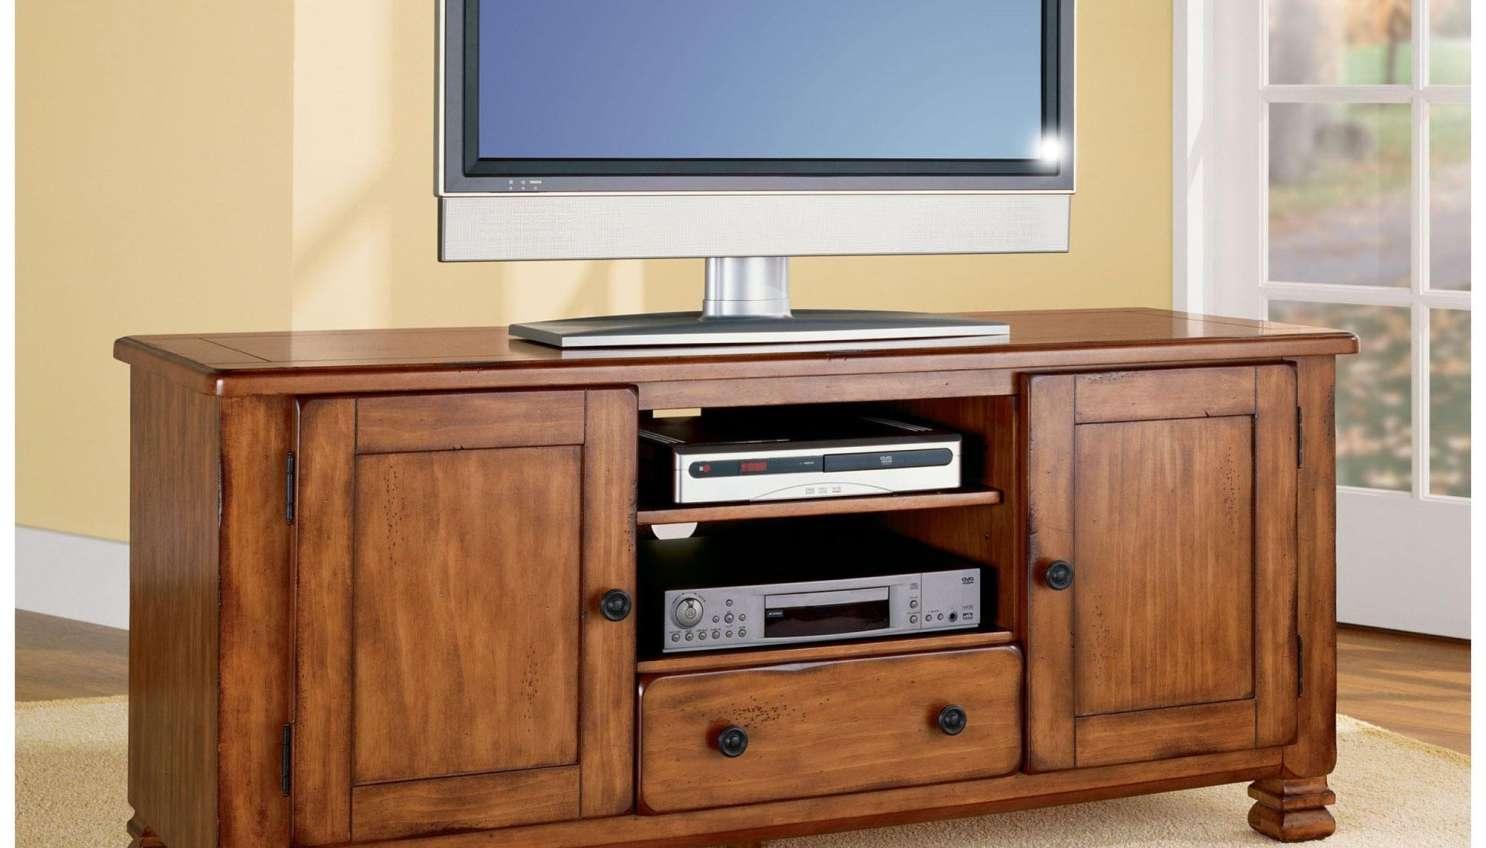 Tv : Astounding Corner Tv Stands For 46 Inch Flat Screen Satiating With Regard To Corner Tv Stands For 46 Inch Flat Screen (View 11 of 15)